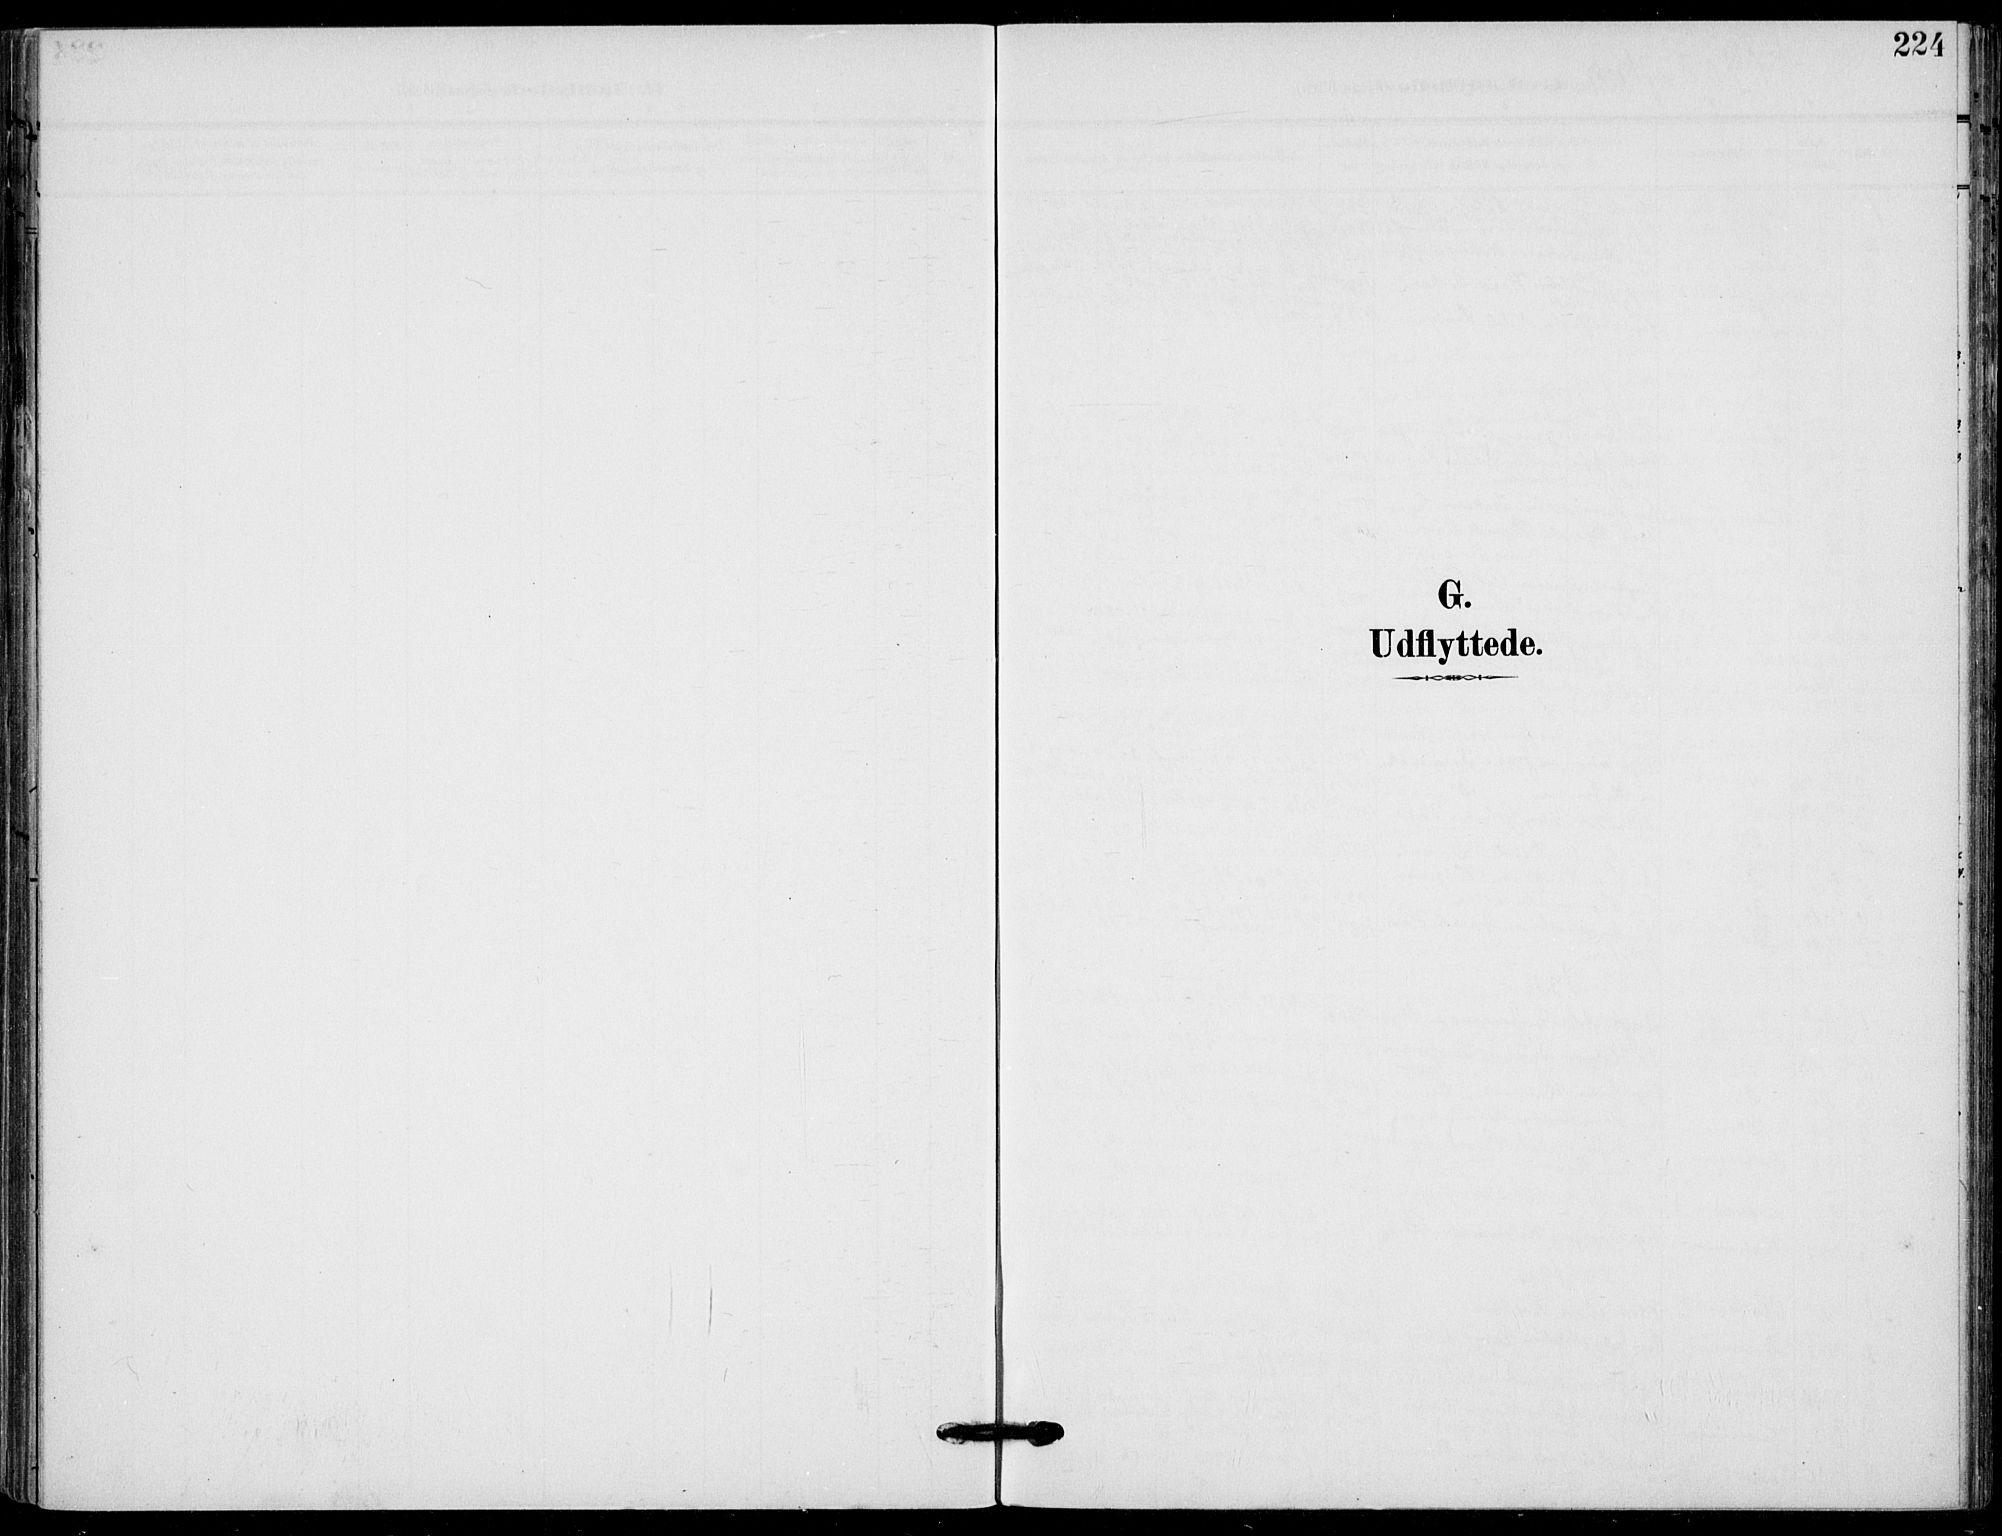 SAKO, Holla kirkebøker, F/Fa/L0012: Ministerialbok nr. 12, 1907-1923, s. 224